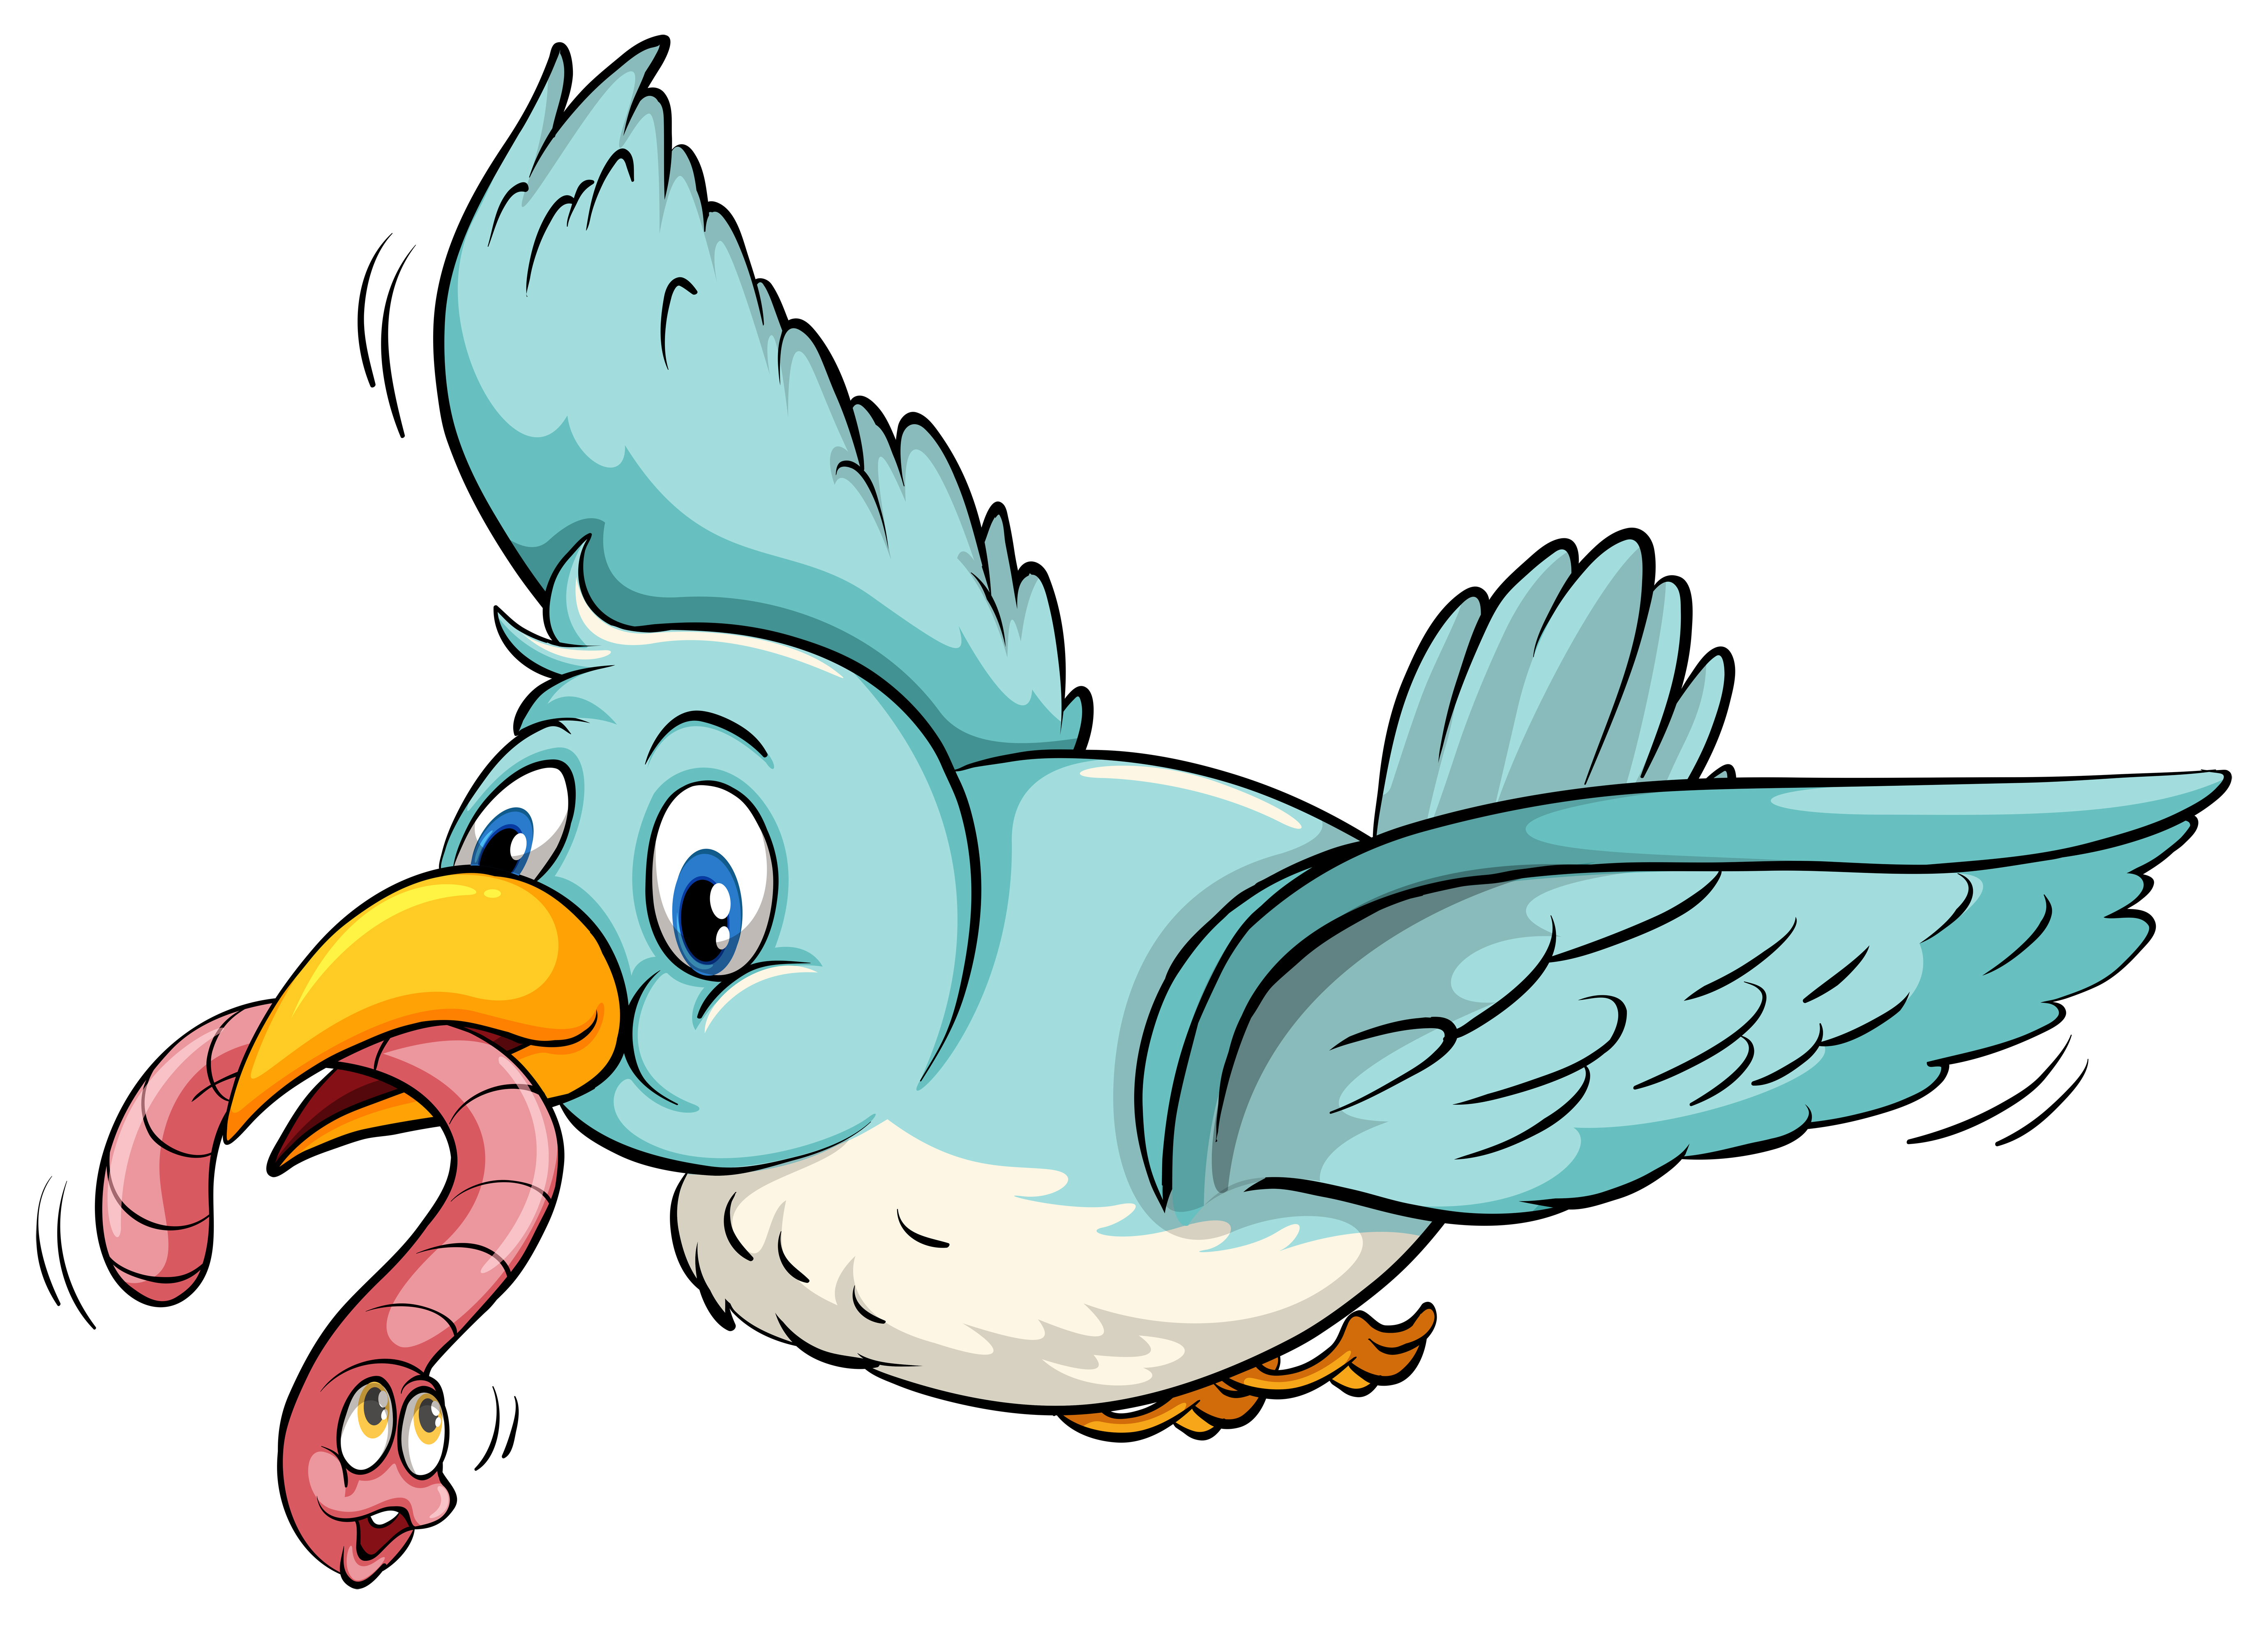 Flying bird - Download Free Vectors, Clipart Graphics ... - photo#14